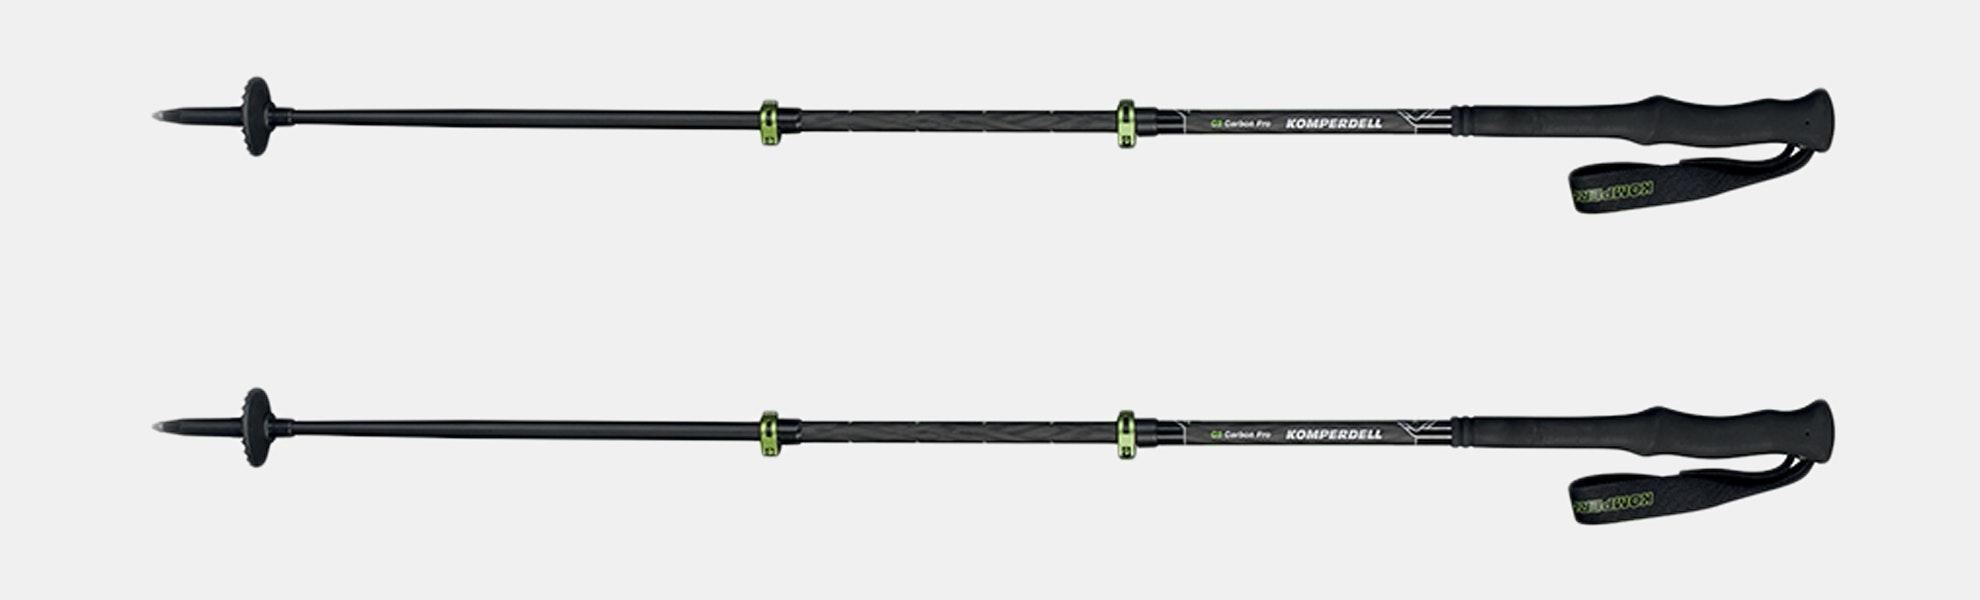 Komperdell C3 Carbon Pro Trekking Poles (2018)